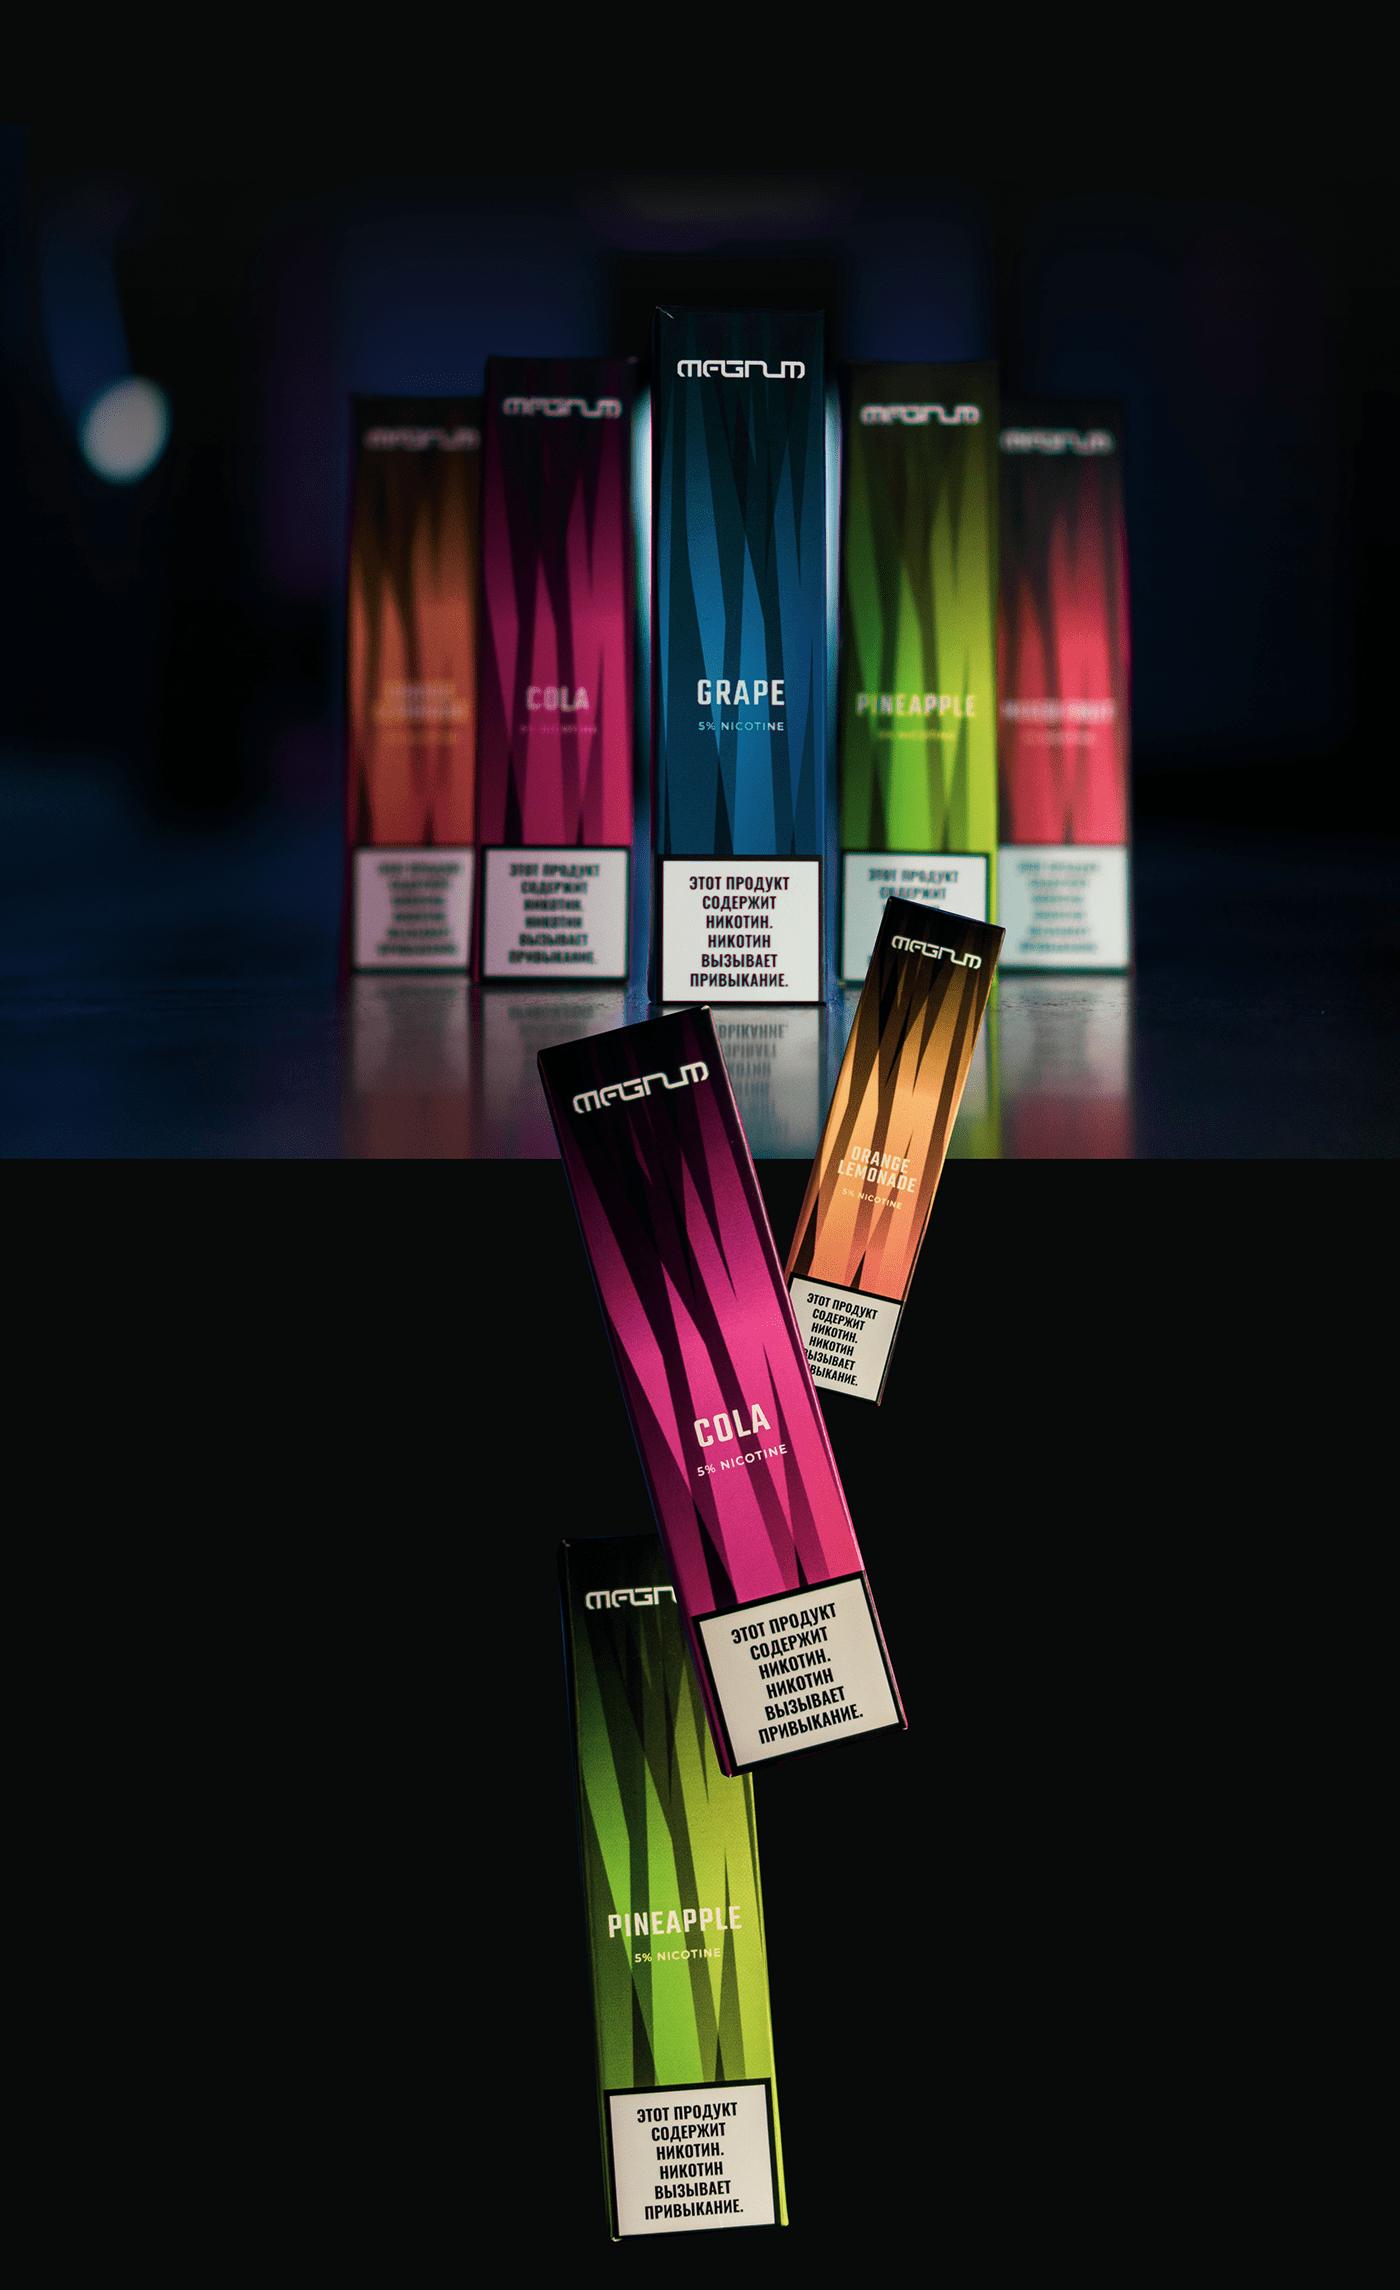 branding  ecigs graphic design  package Vape vaping дизайн упаковки упаковка Электронные сигареты брендинг